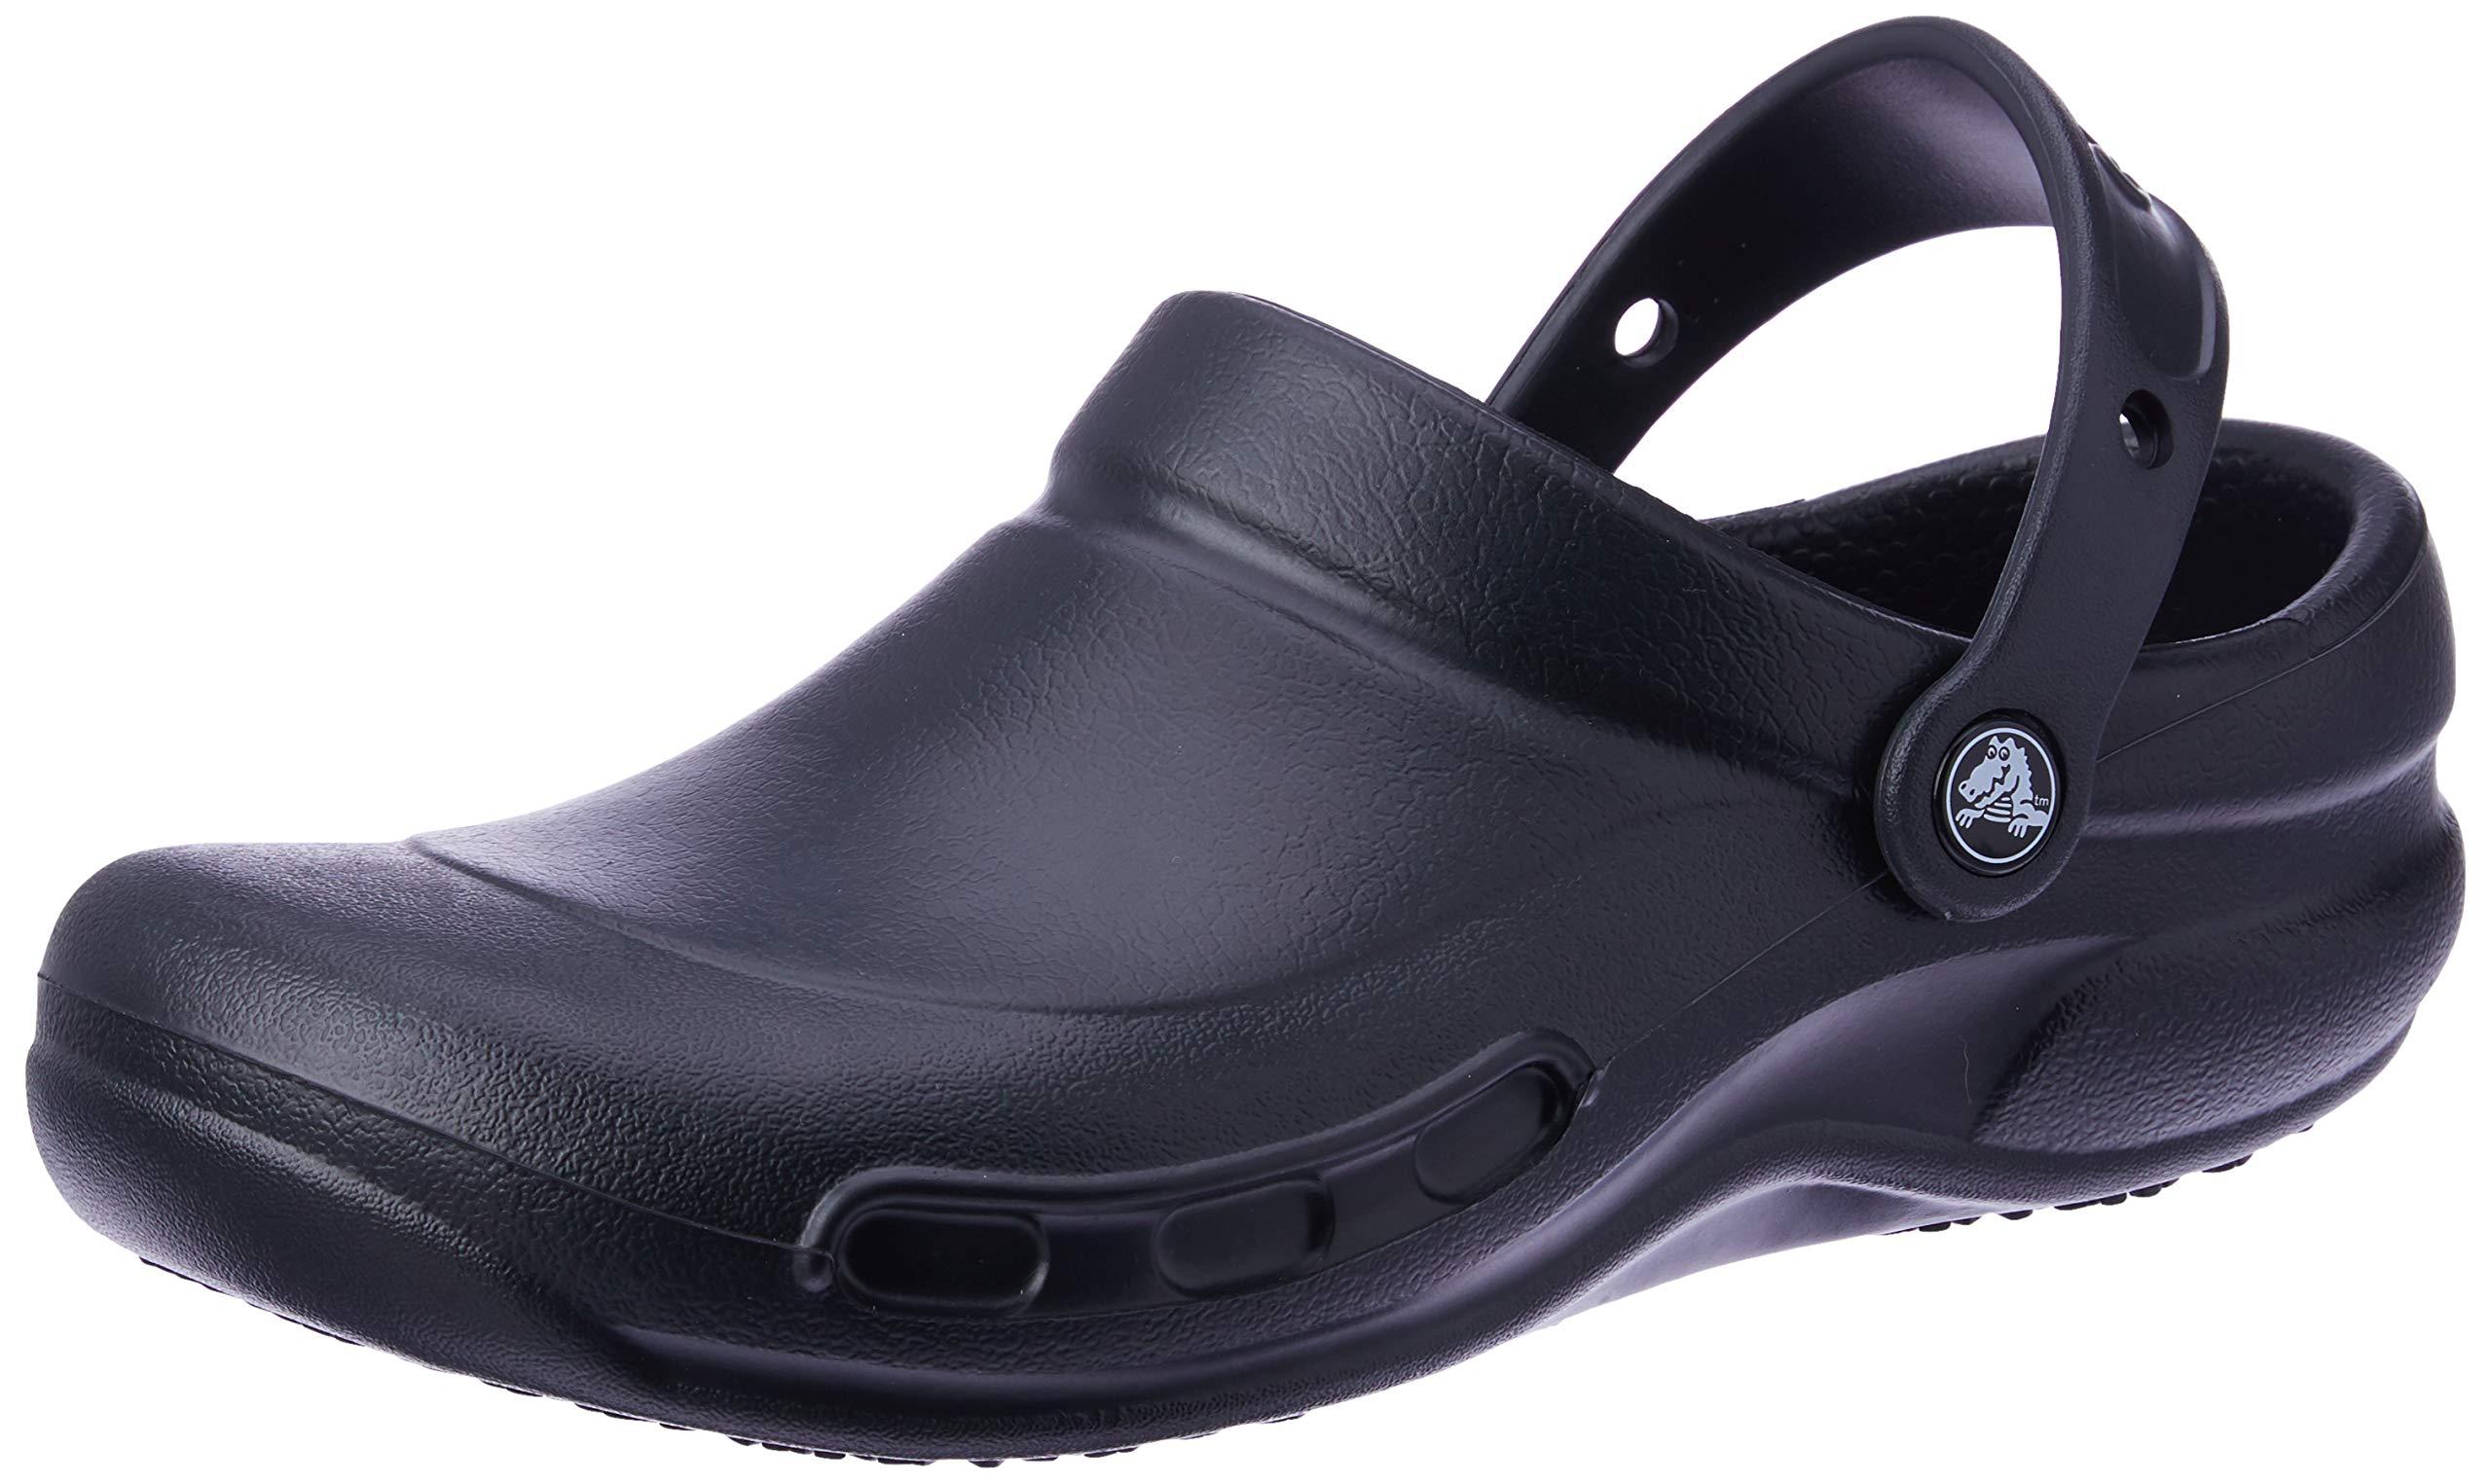 Crocs Bistro Clog, Black, 6 US Men / 8 US Women by Crocs